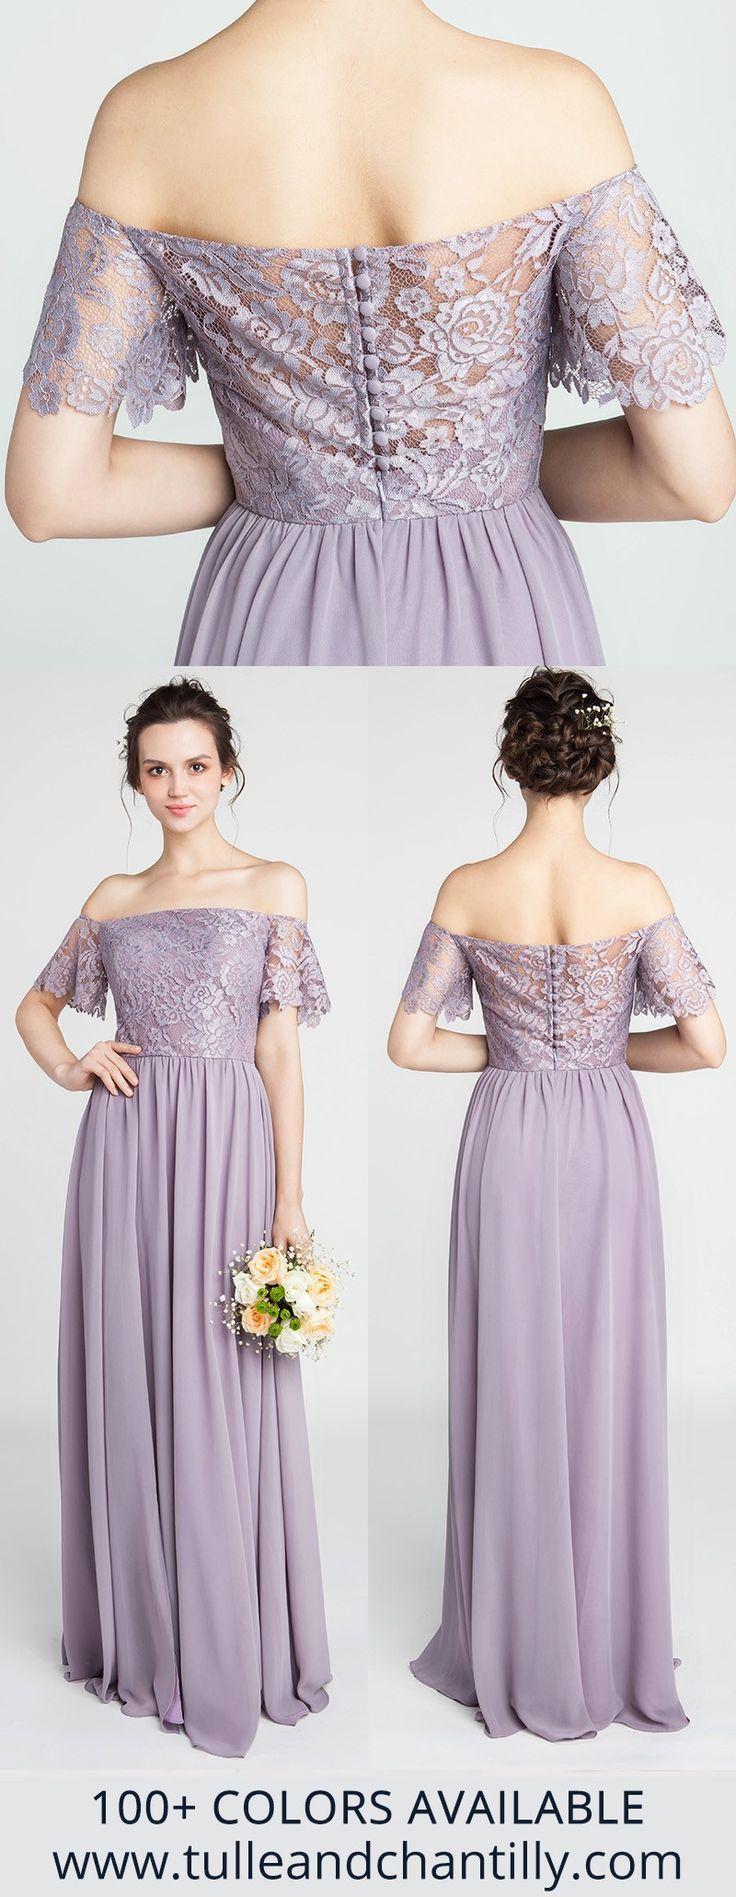 Gorgeous Lace Off-the-Shoulder Mauve Purple Bridesmaid Dresses with Chiffon Skirt